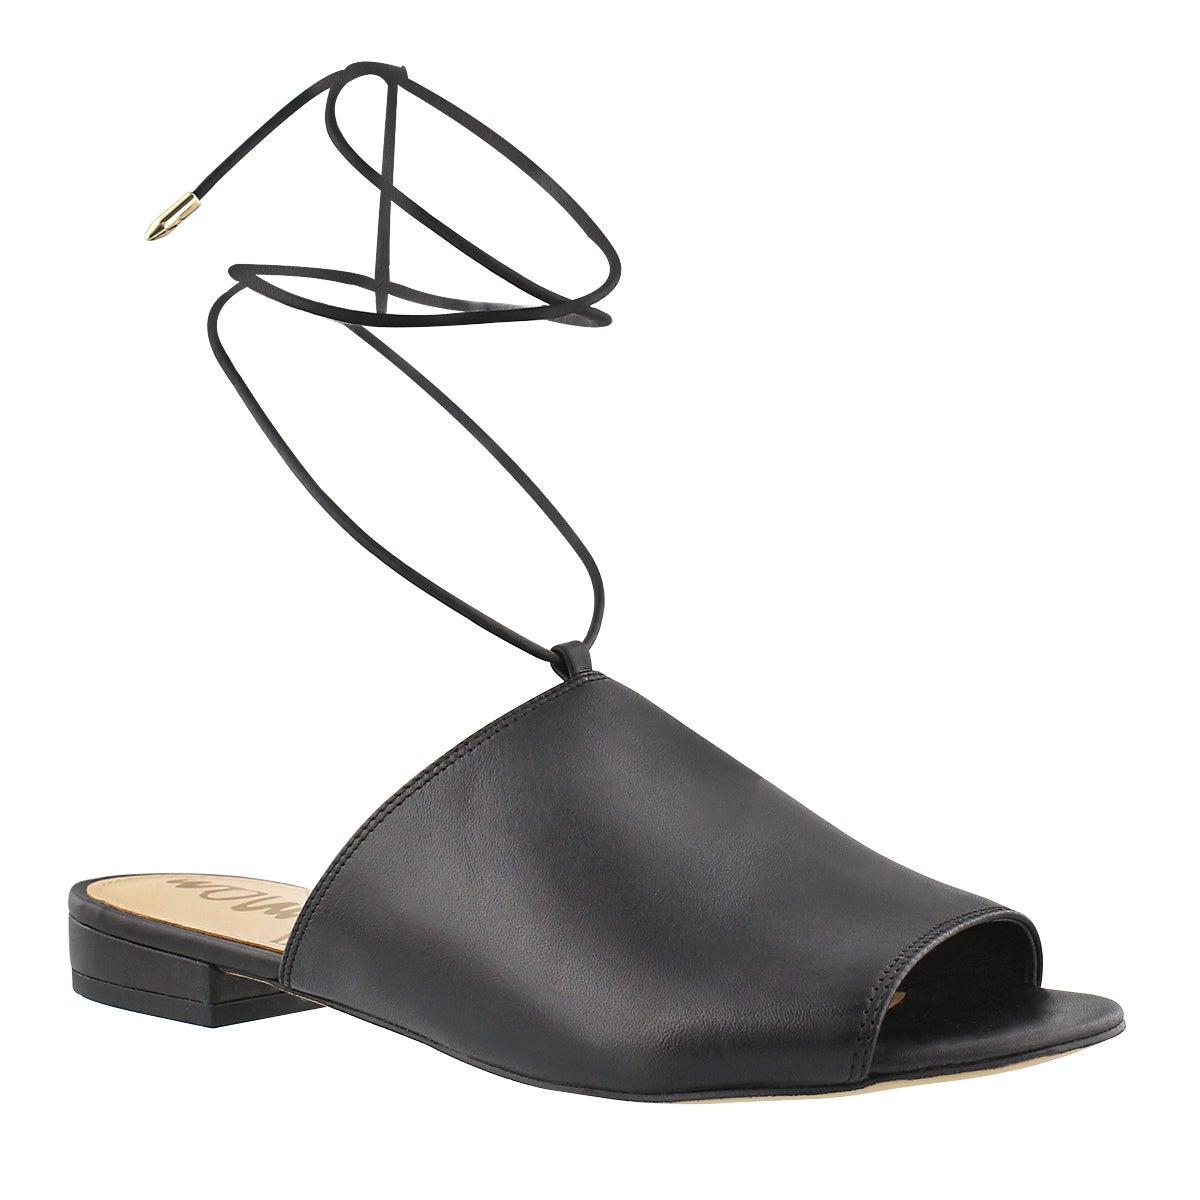 Women's TAI black casual slide sandals